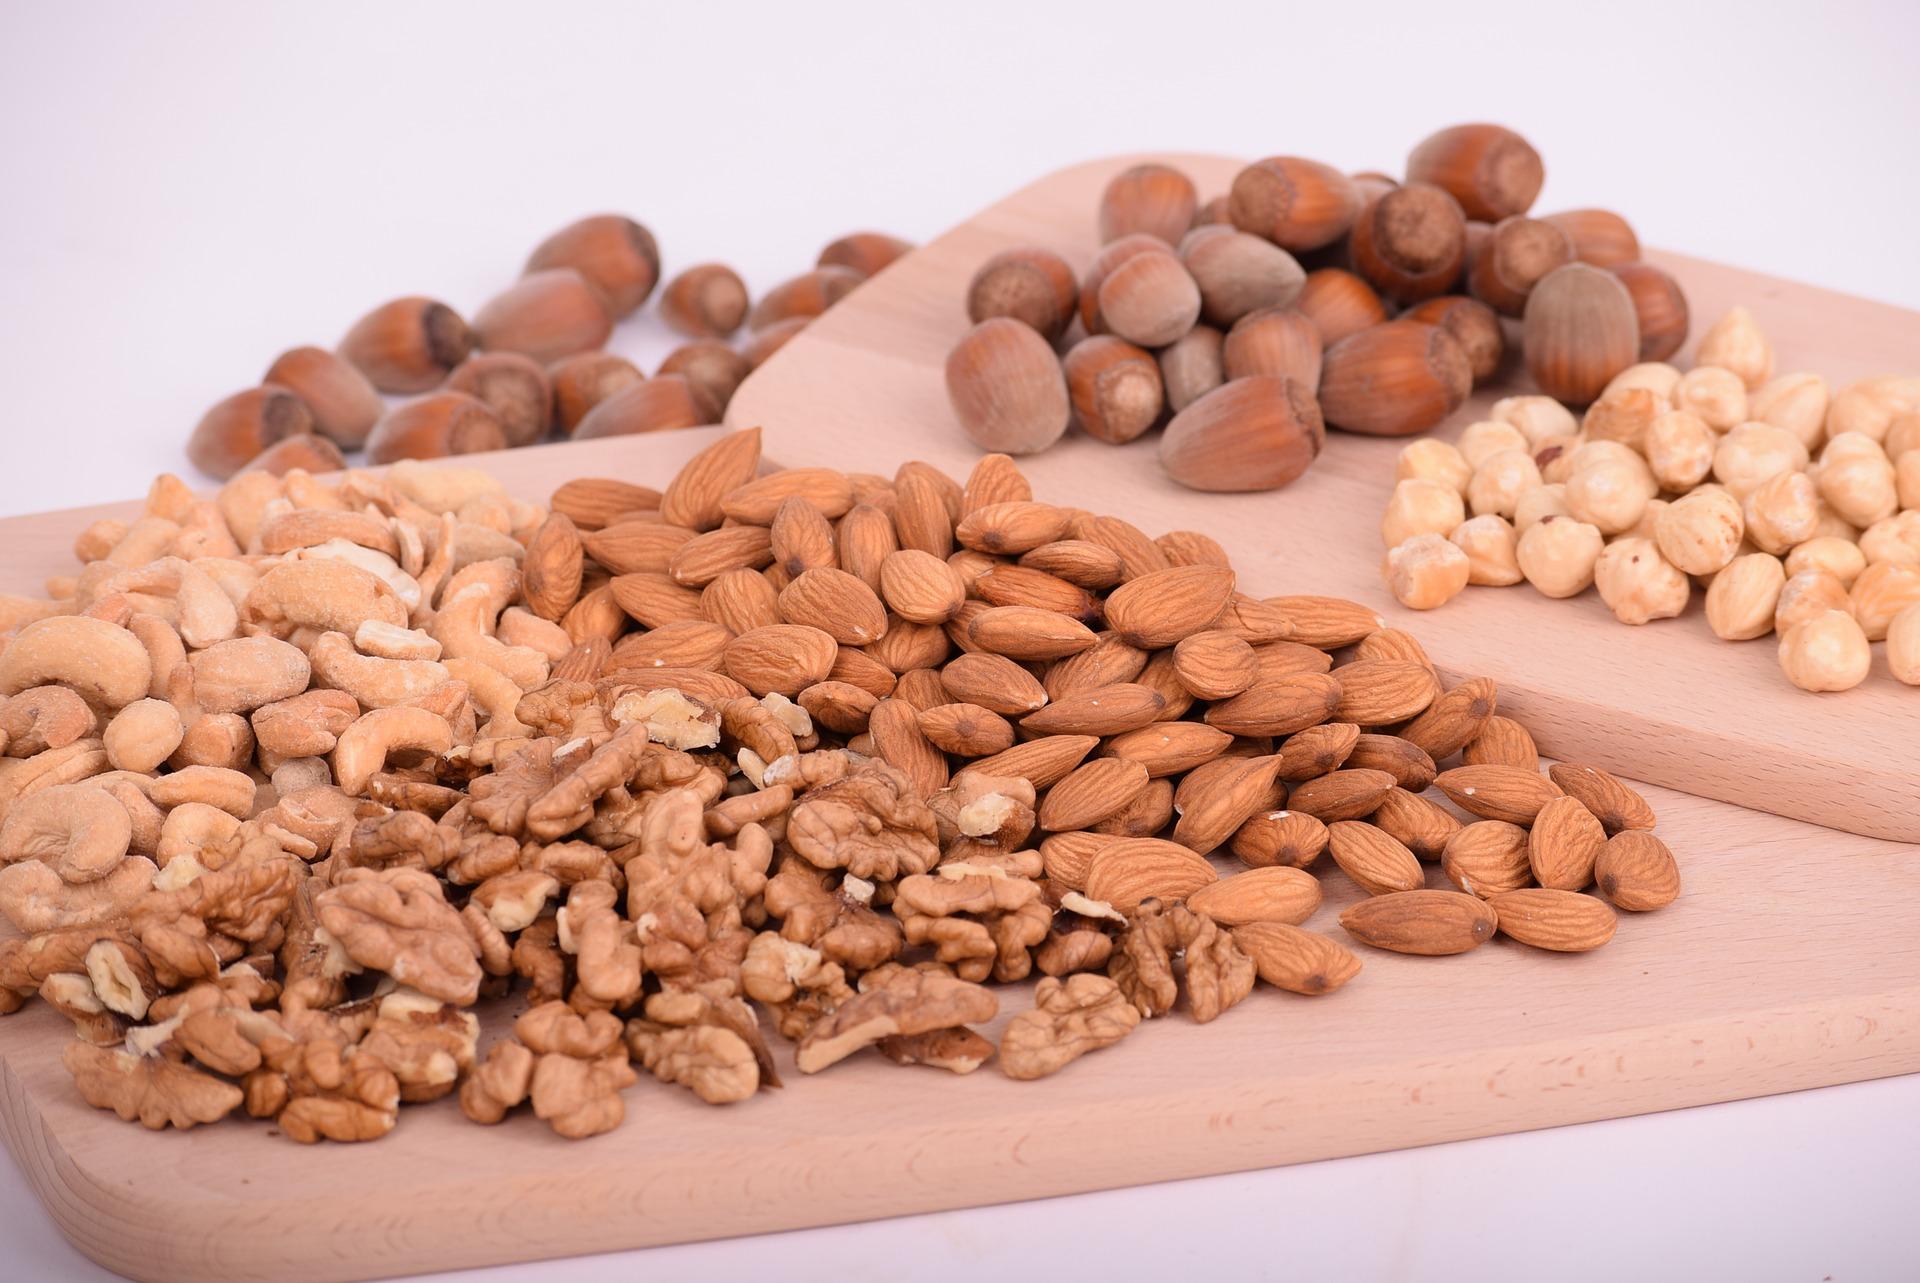 Benefits of Raw Food Diet